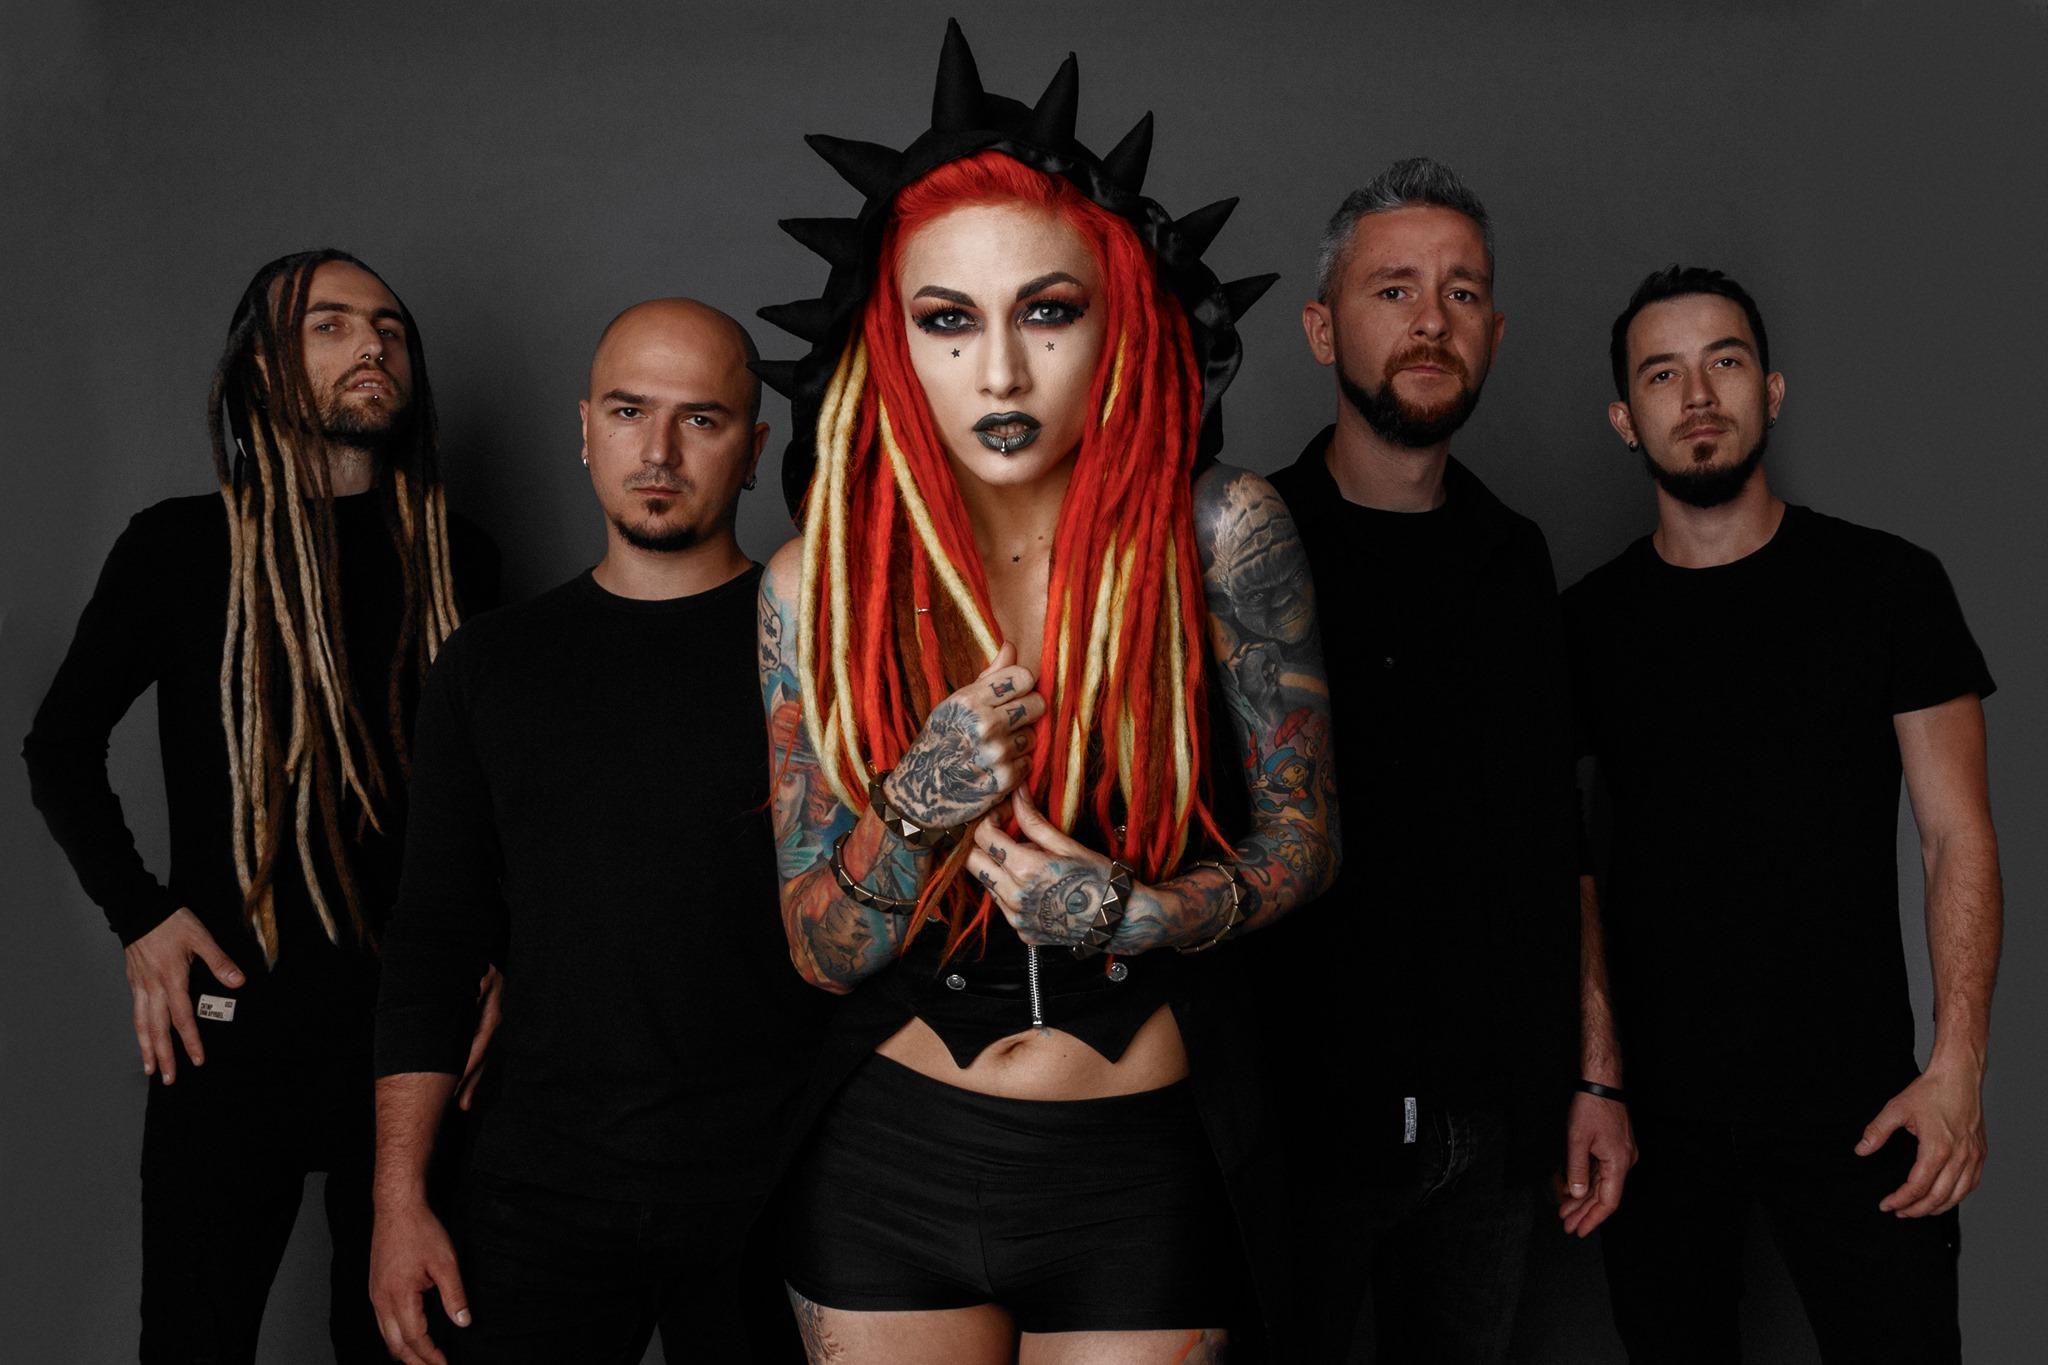 INFECTED RAIN - An interview with Lena Scissorhands - Femme Metal Webzine